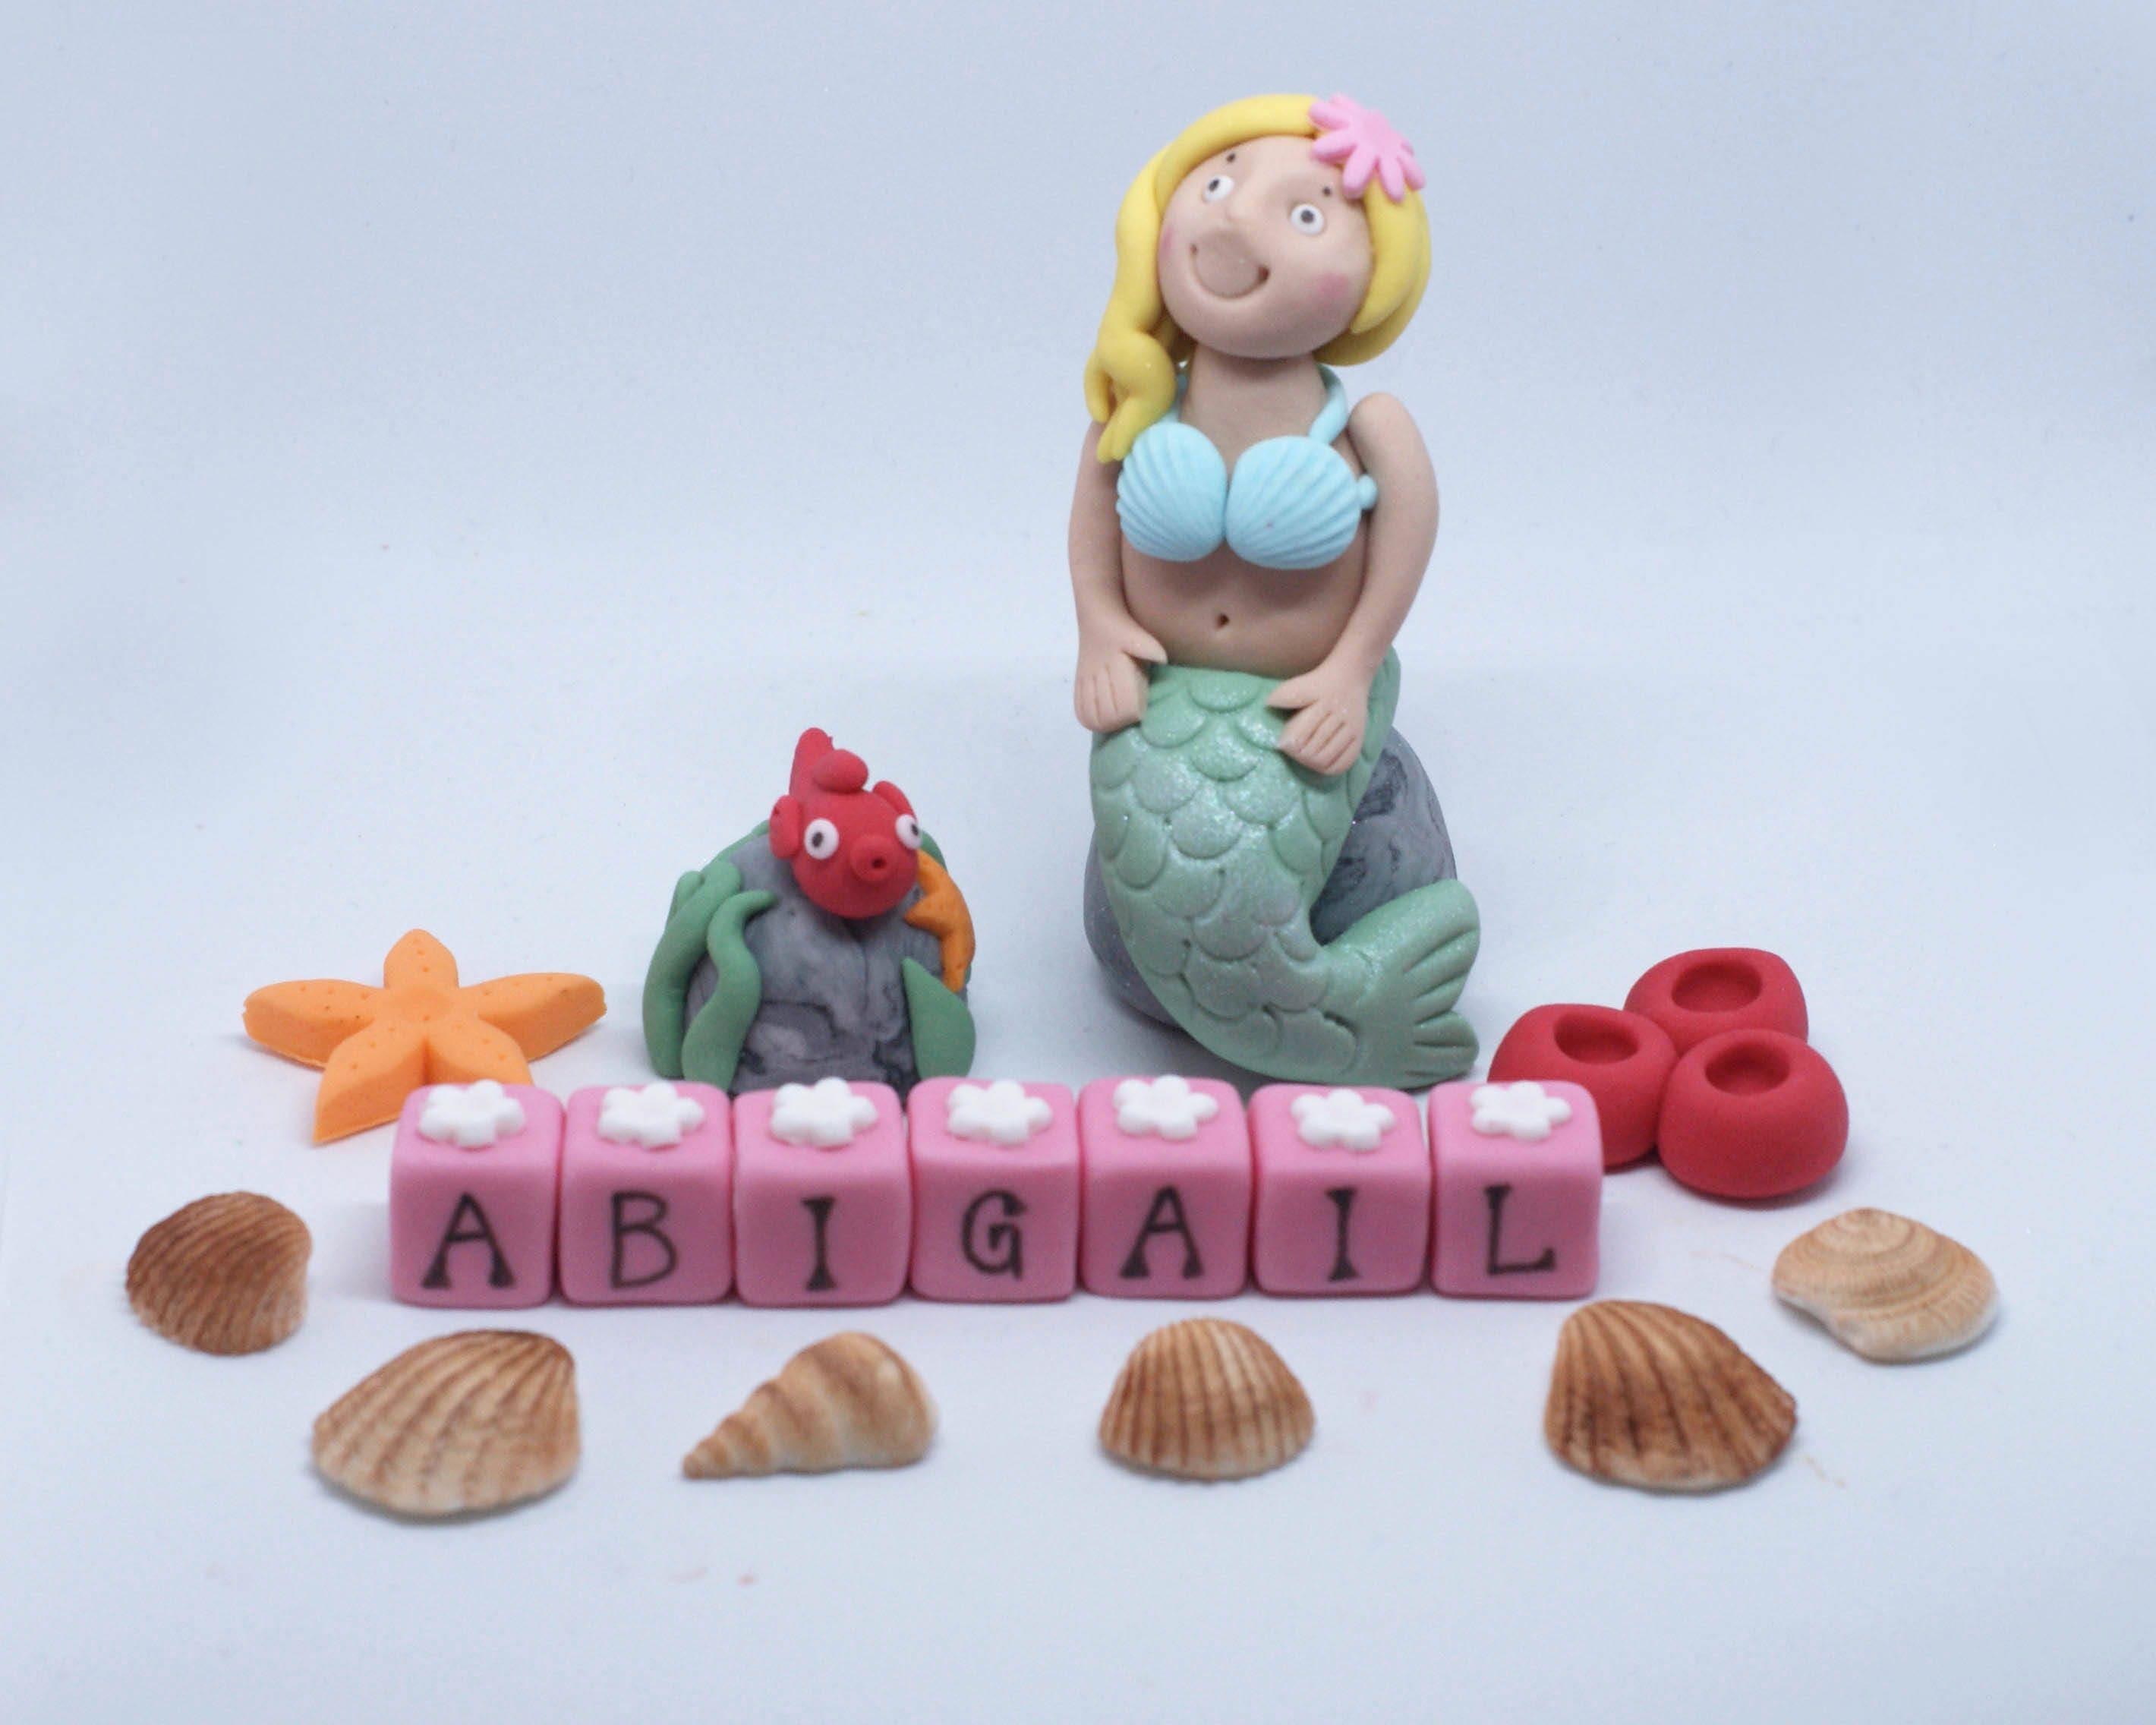 Personalised Handmade Sugar Edible Mermaid Birthday Cake